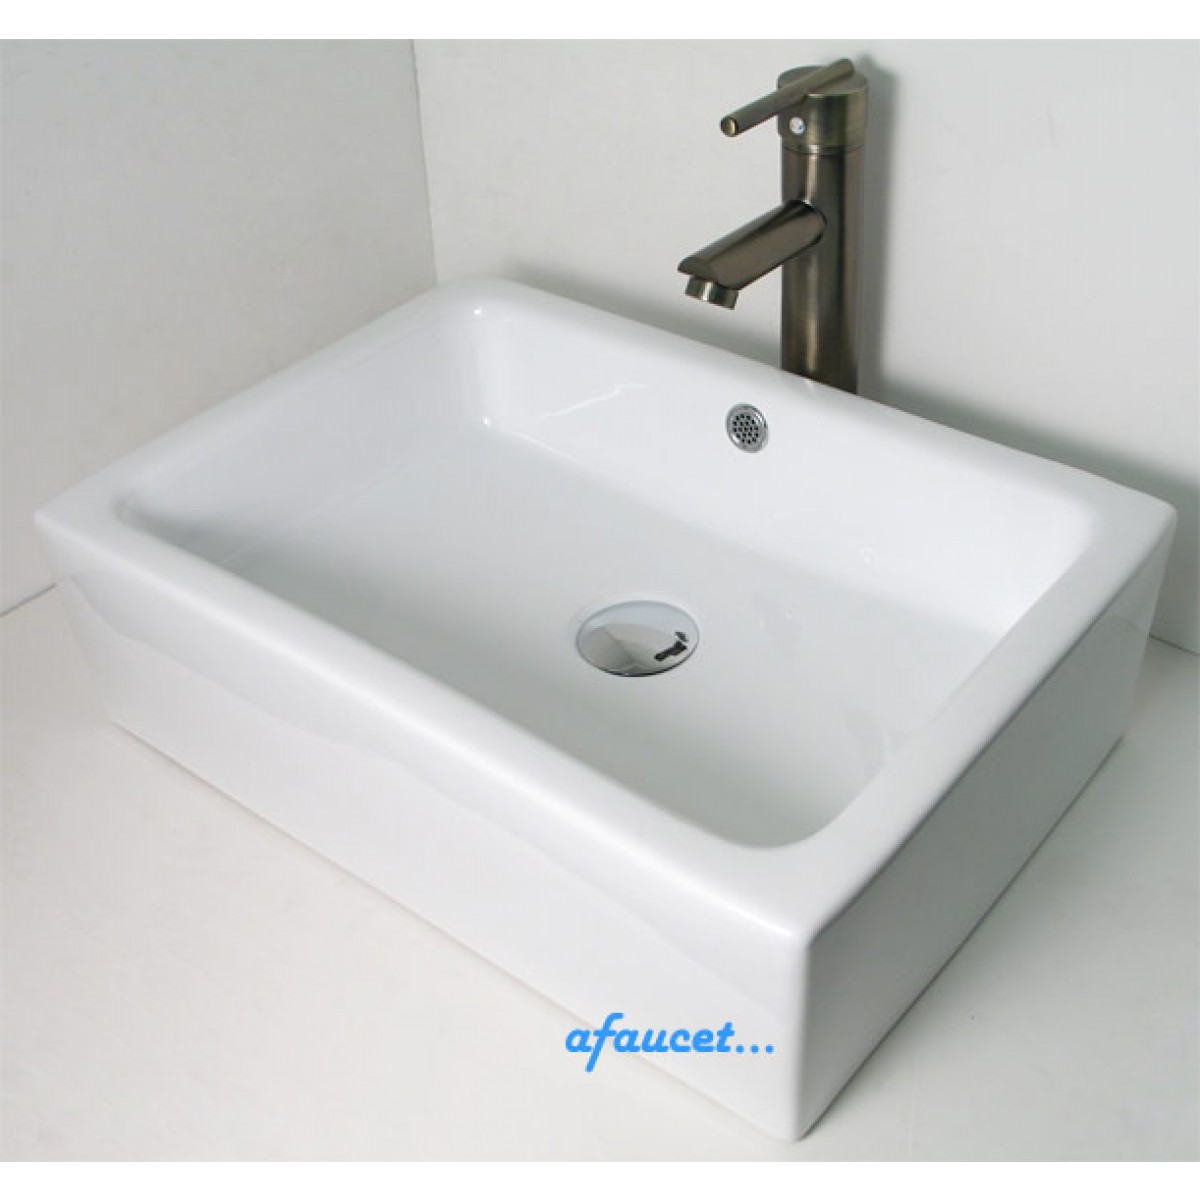 Bathroom Sinks That Sit On Top Of Counter rectangular porcelain ceramic white / black bathroom vessel sink